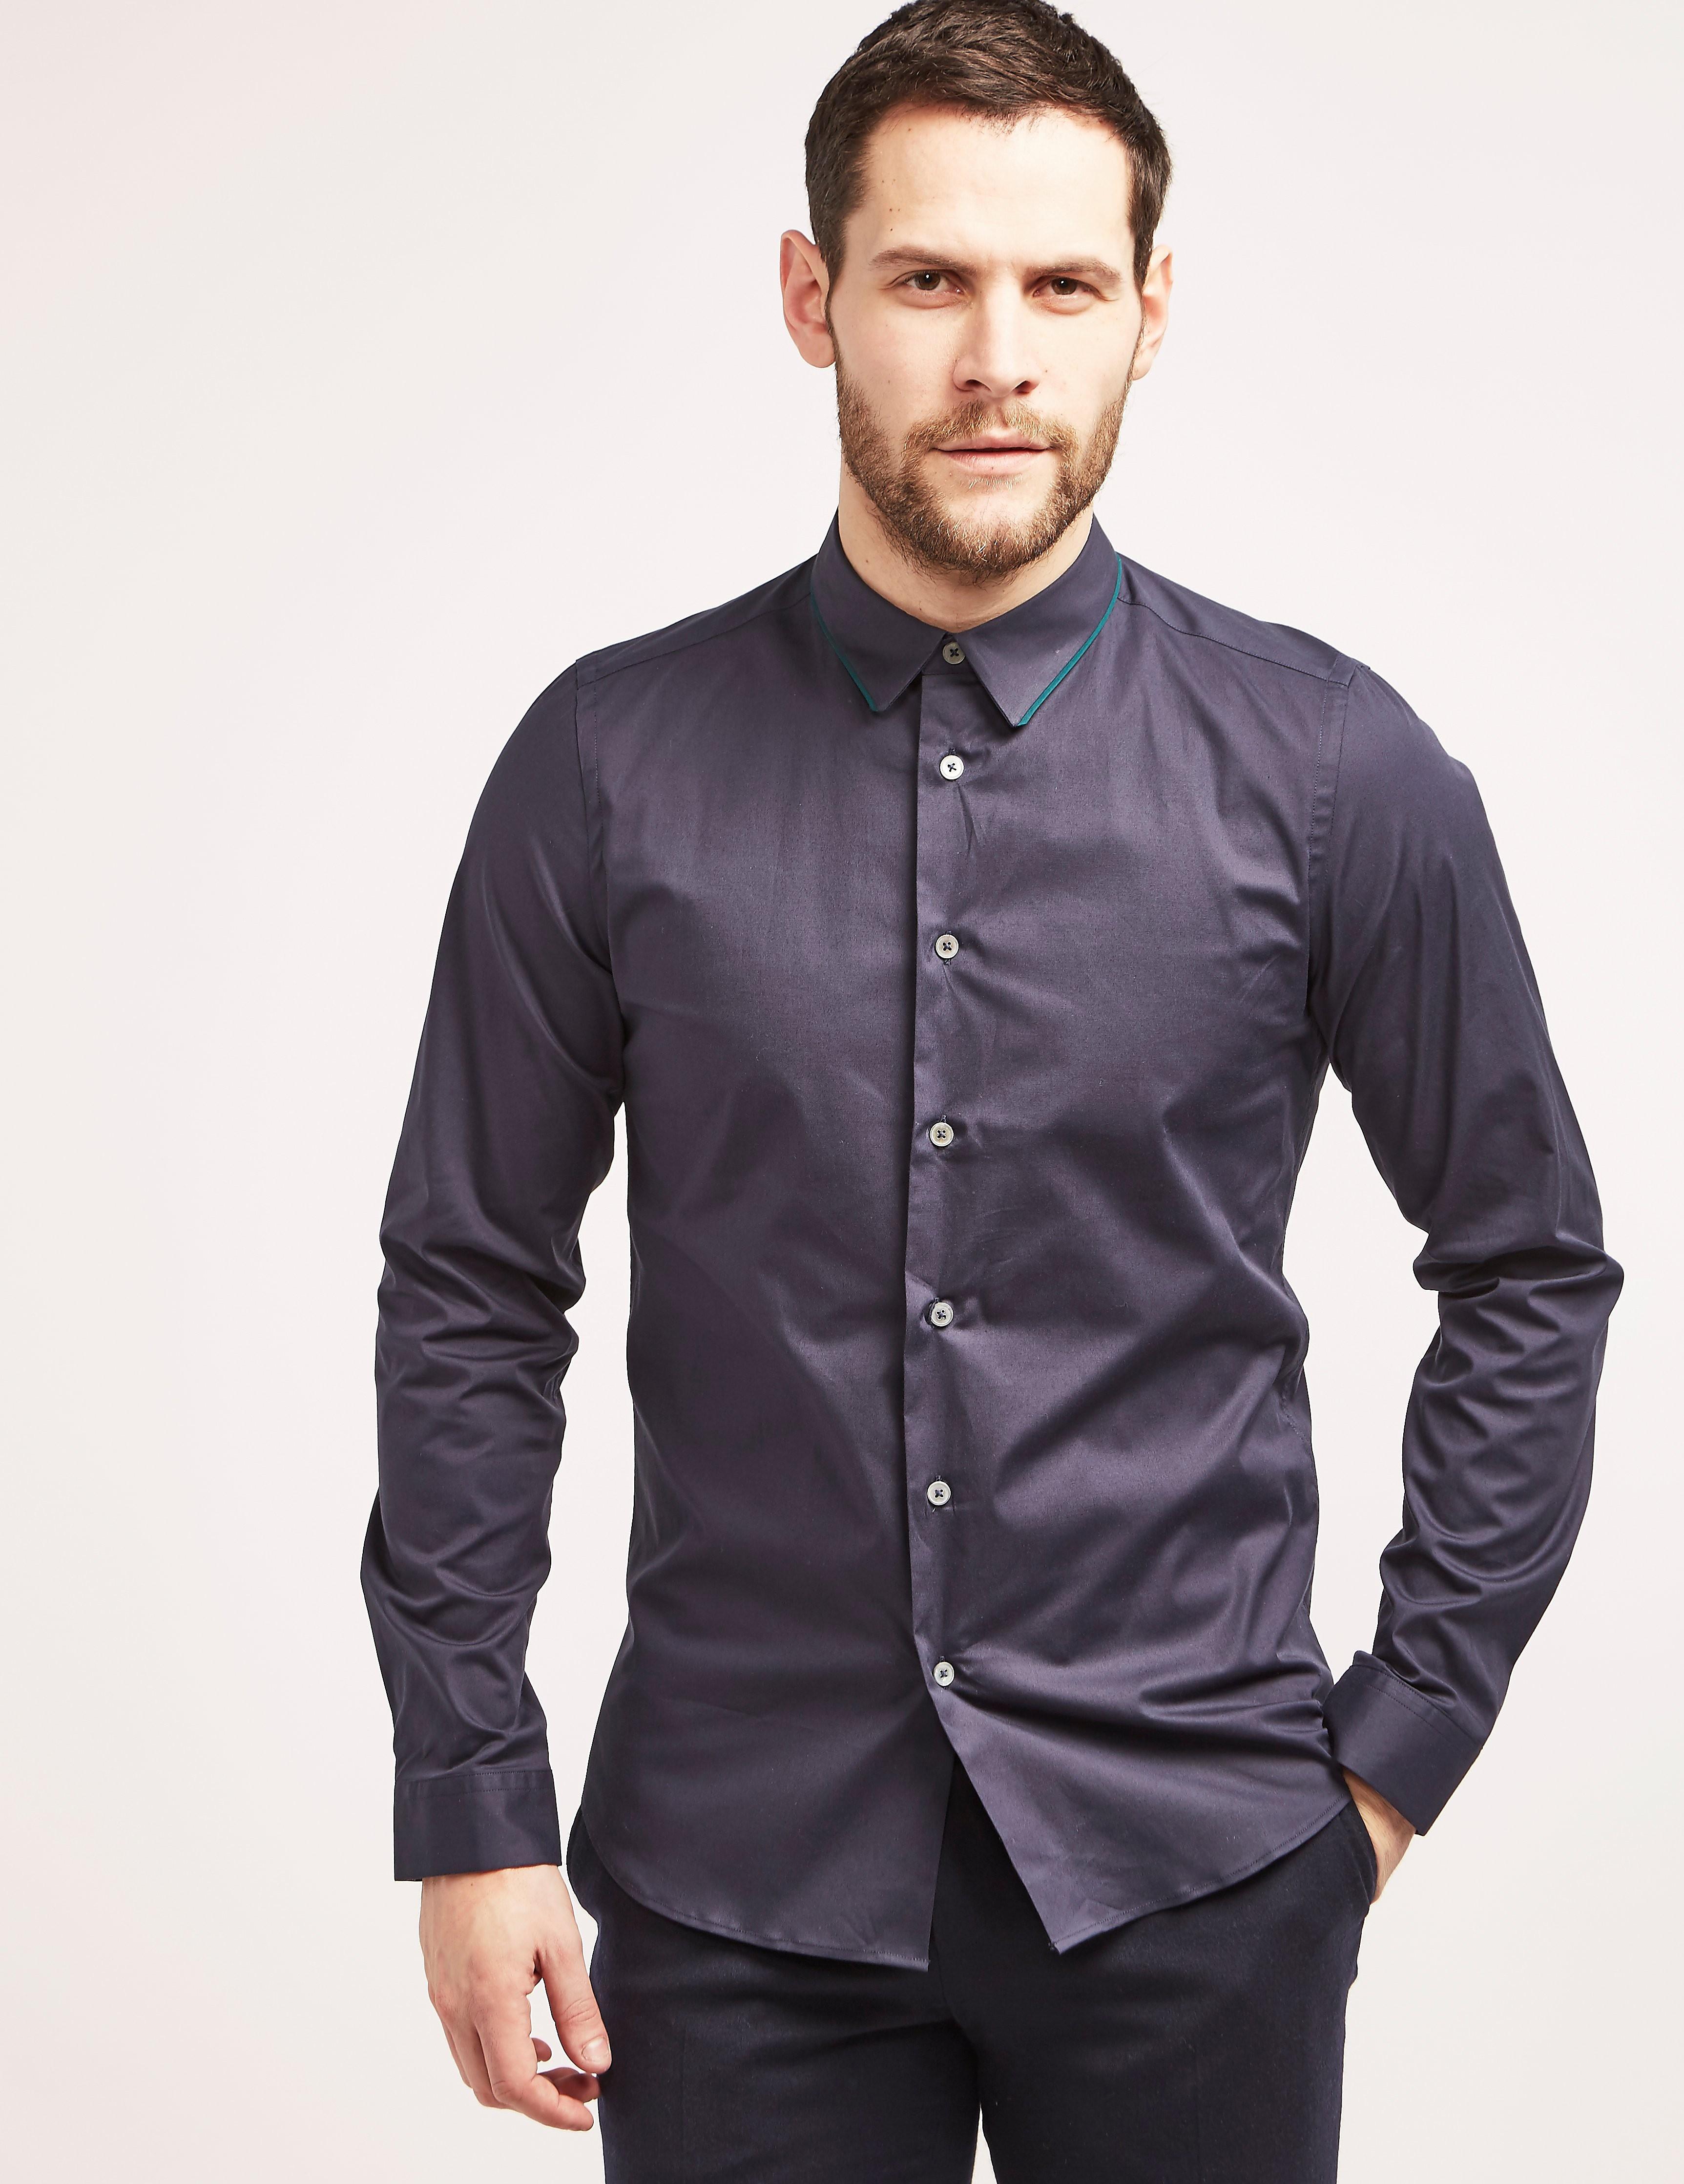 Paul Smith Tipped Collar Shirt